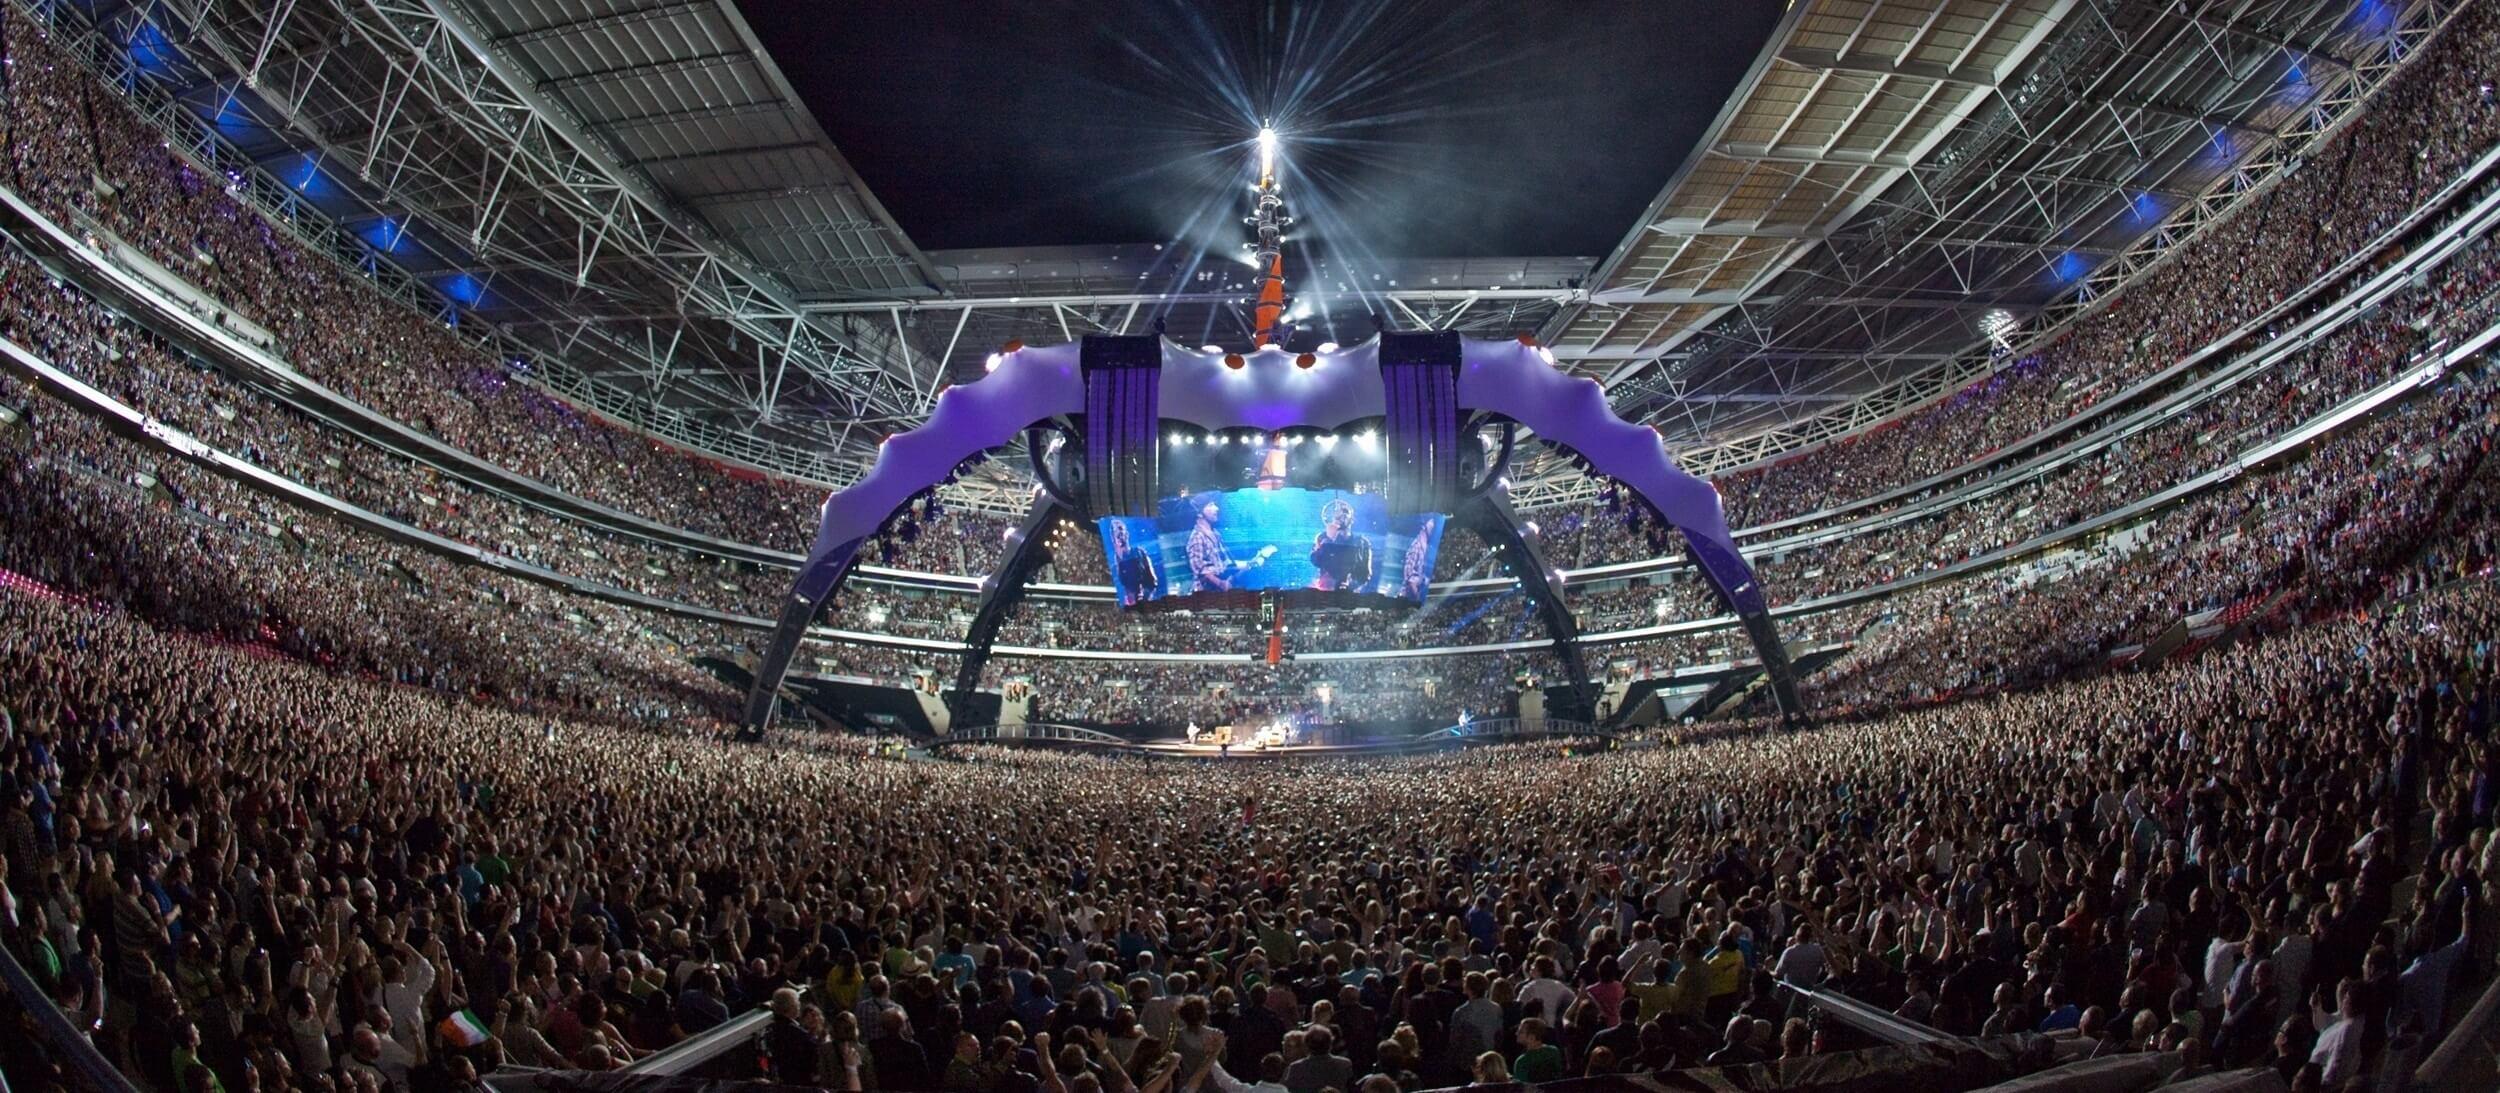 File:U2 360 Tour Croke Park.jpg